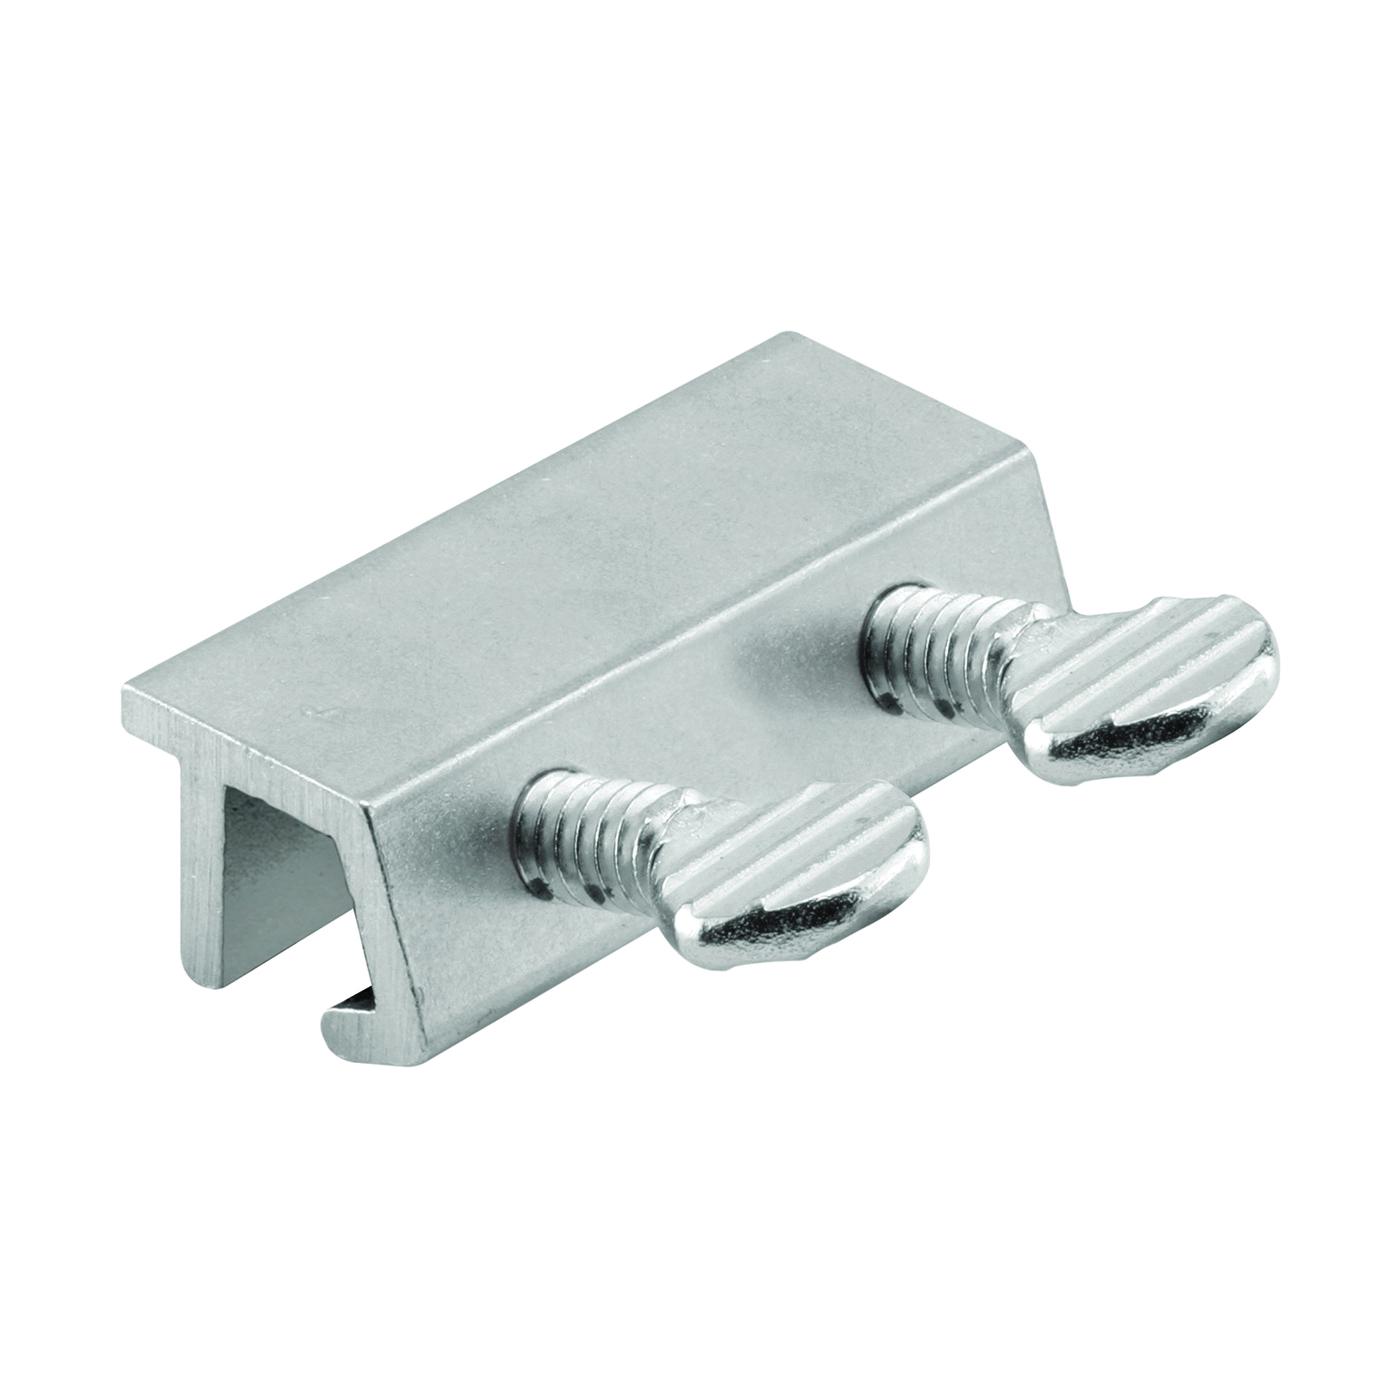 Picture of Prime-Line U 10679 Patio Door Lock, Aluminum, Aluminum, 3/16, 1/8, 1/4 in Thick Door